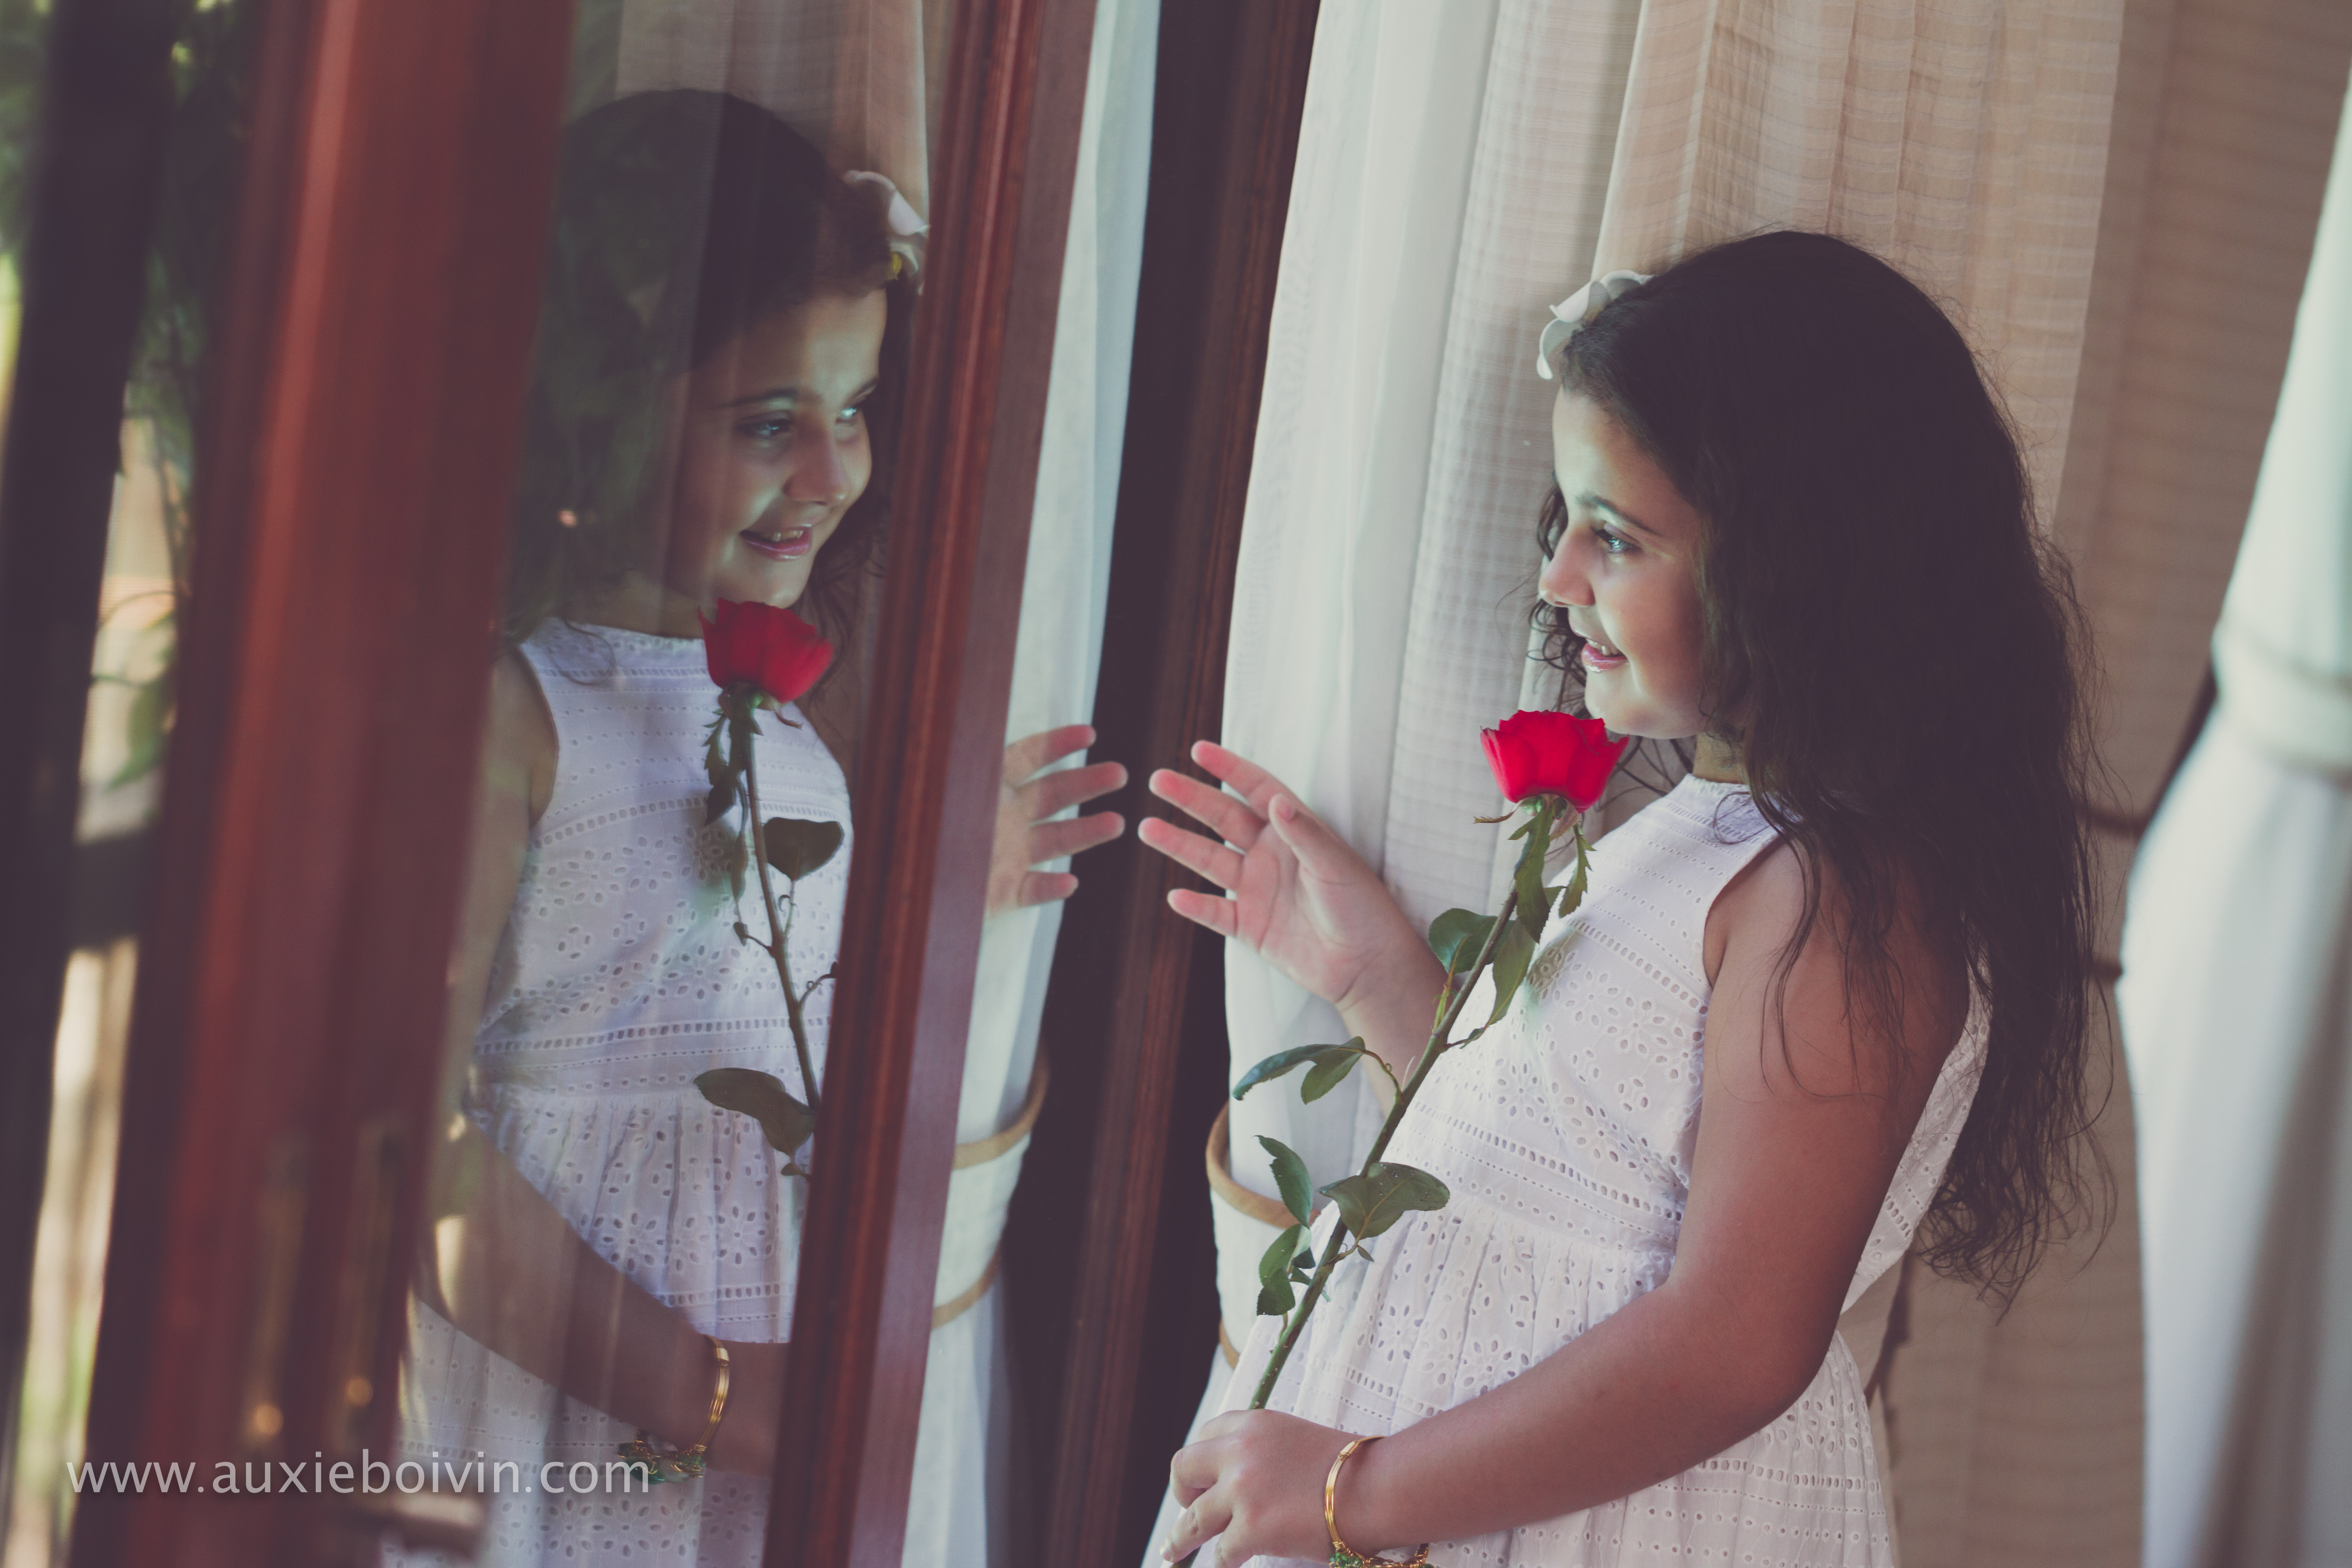 enfants portrait reflet